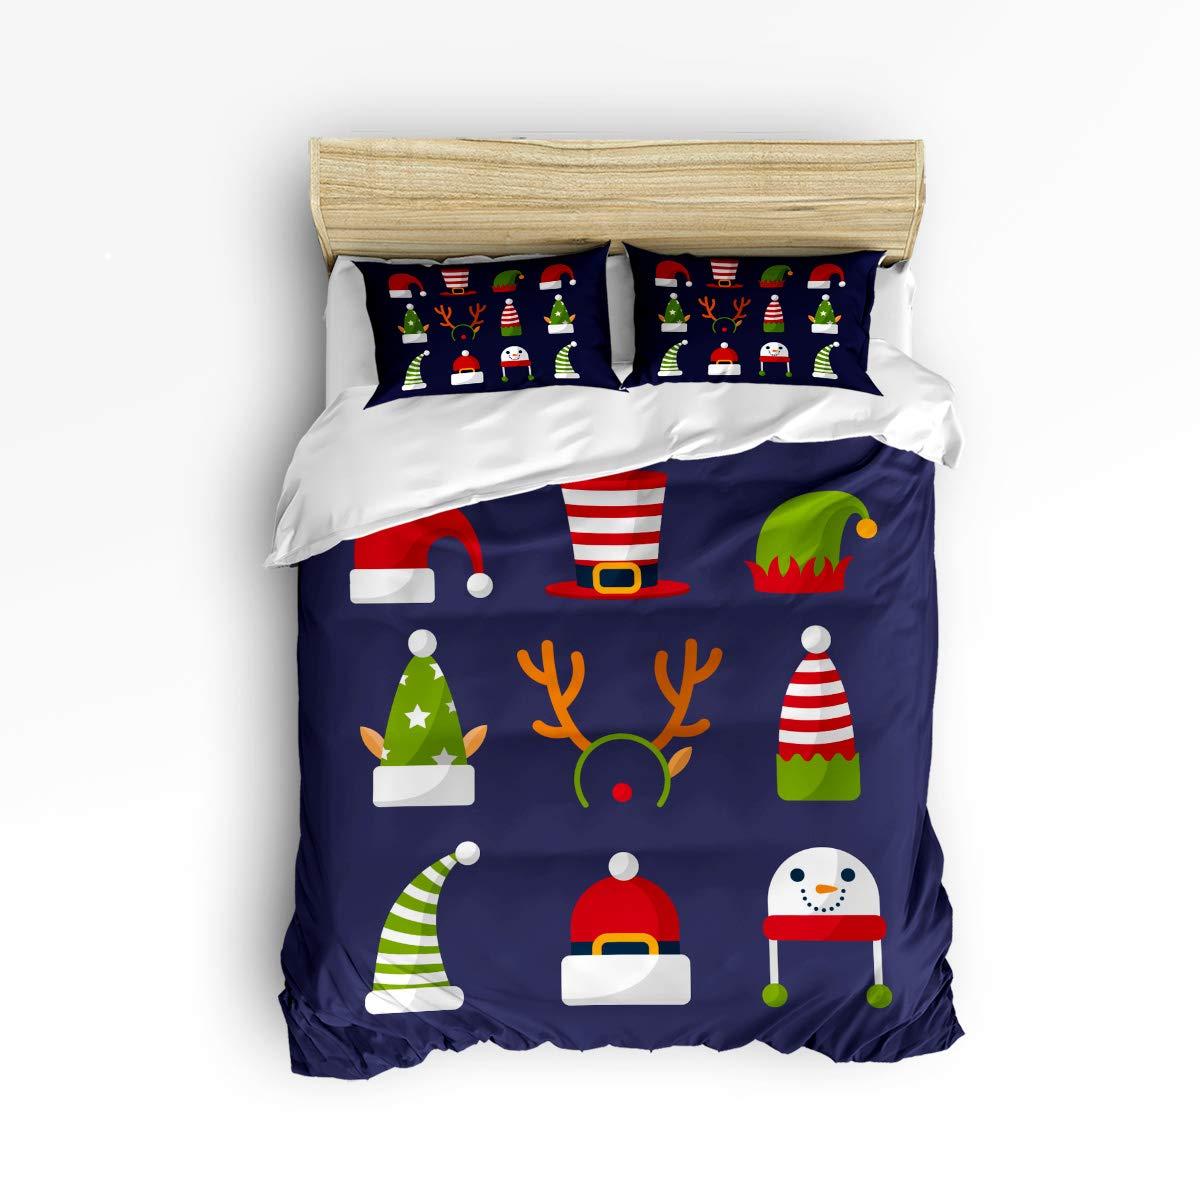 Libaoge 寝具3点セット ツイン フル カリフォルニア クイーン キングサイズ ソフトで丈夫 クリスマス 雪の結晶 星柄 プリントダウン 掛け布団カバー お揃いの枕カバー2枚 King Size WSJ-181112-3pcsXma-SWTQ00935SJSDLBG B07KVJCZ7V Christmashat3lbg6171 King Size